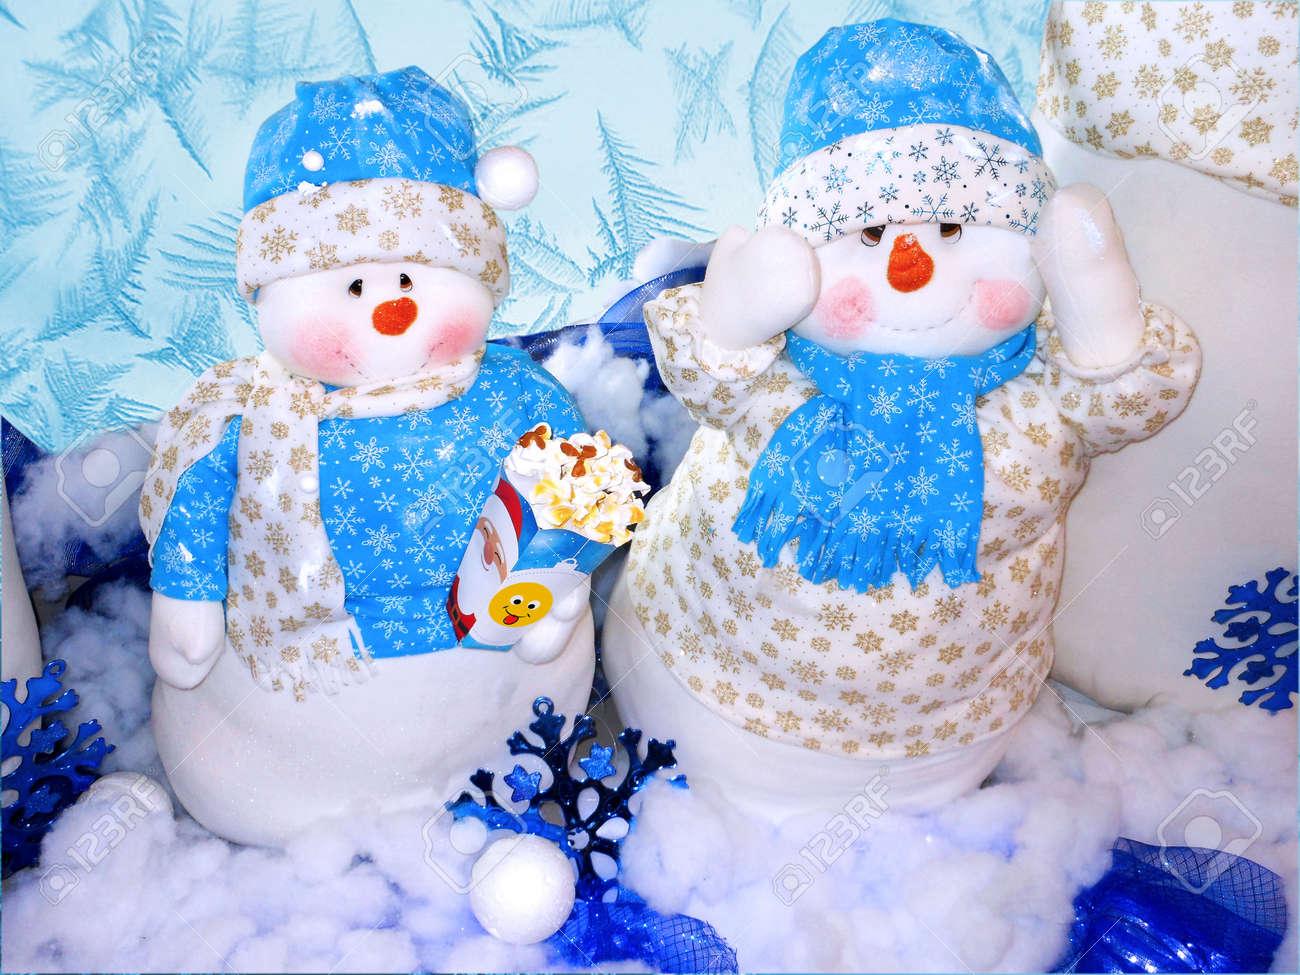 Snowmen At Christmas.Two Snowmen At Christmas